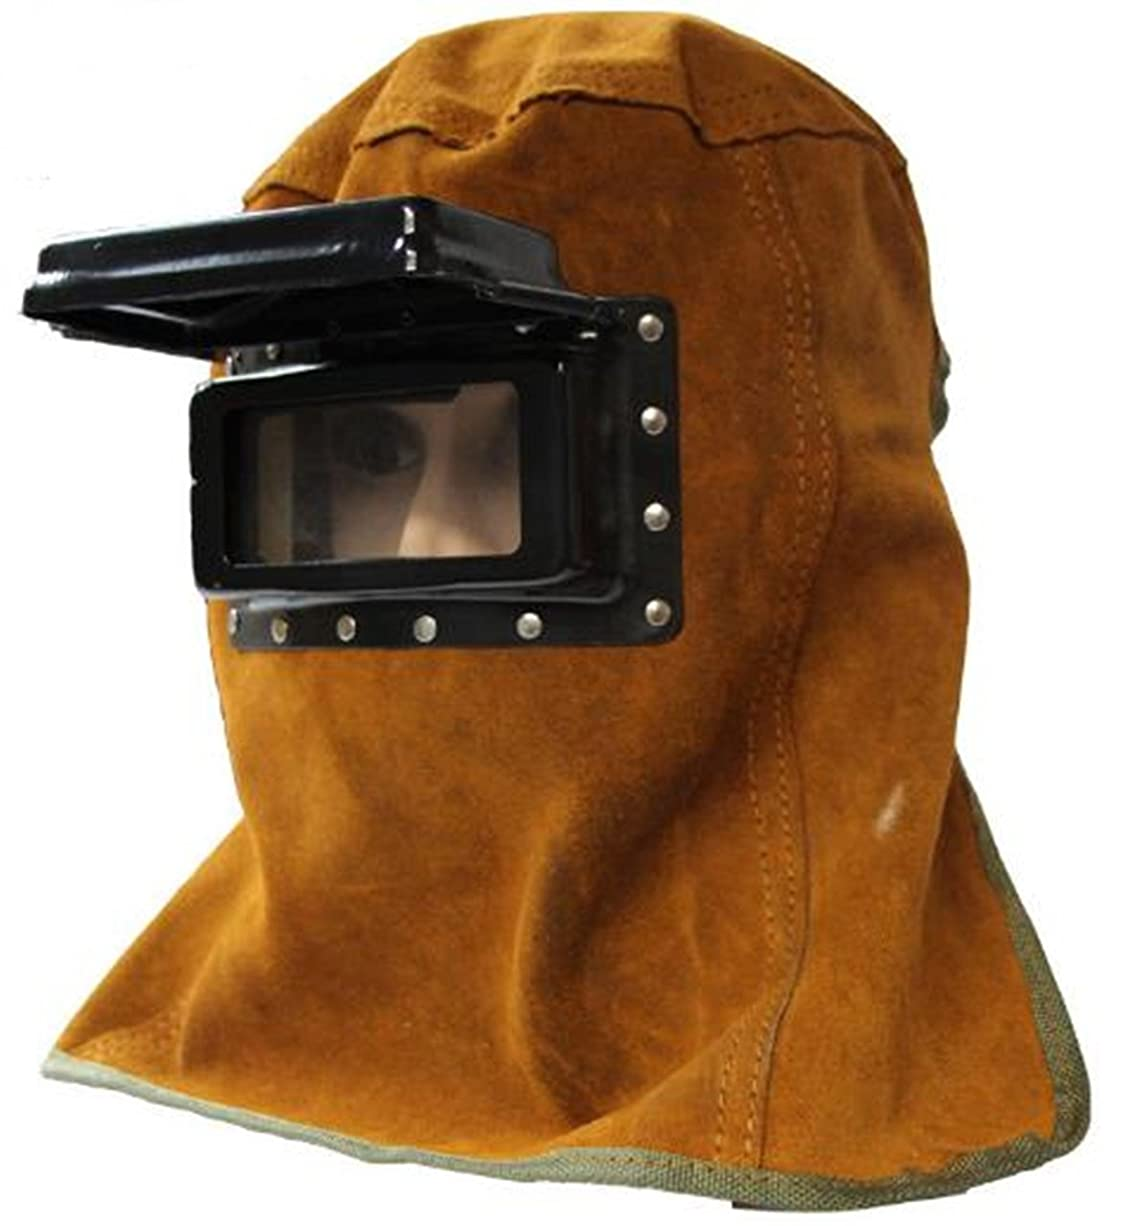 cycle product 牛革 溶接面 マスク 火傷 防止 レザー 保護具 はね上げ式 遮光